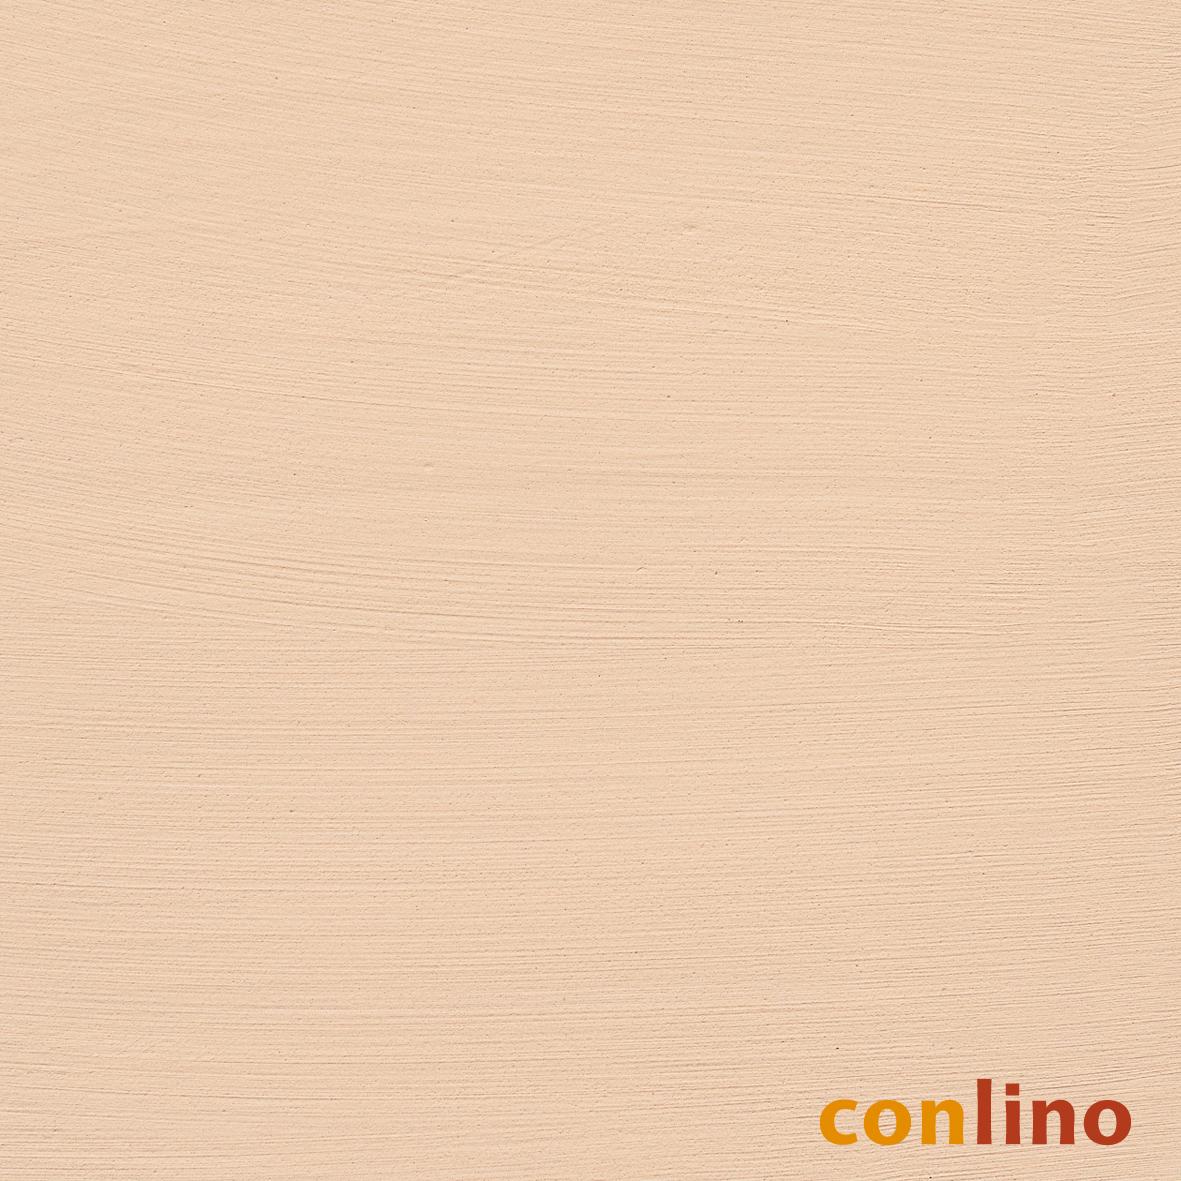 conluto Lehmfarbe Tinaja CL 114